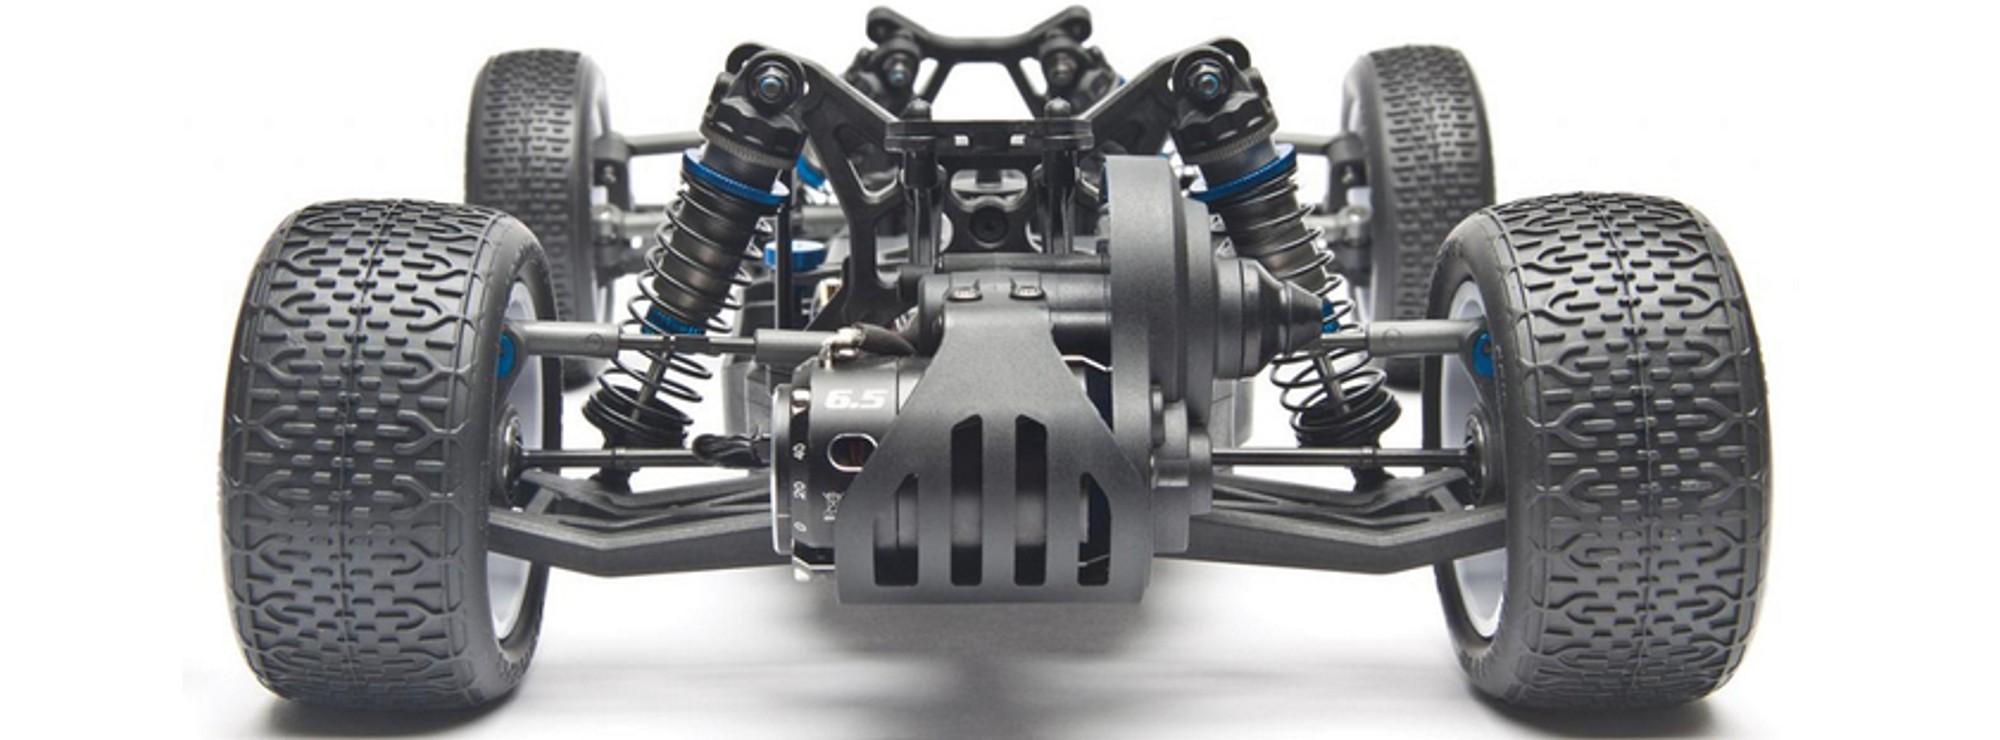 ausverkauft | TeamAssociated 90001 RC10B5 Chassis Kit | Wettbewerbs Offroad  Buggy 1:10